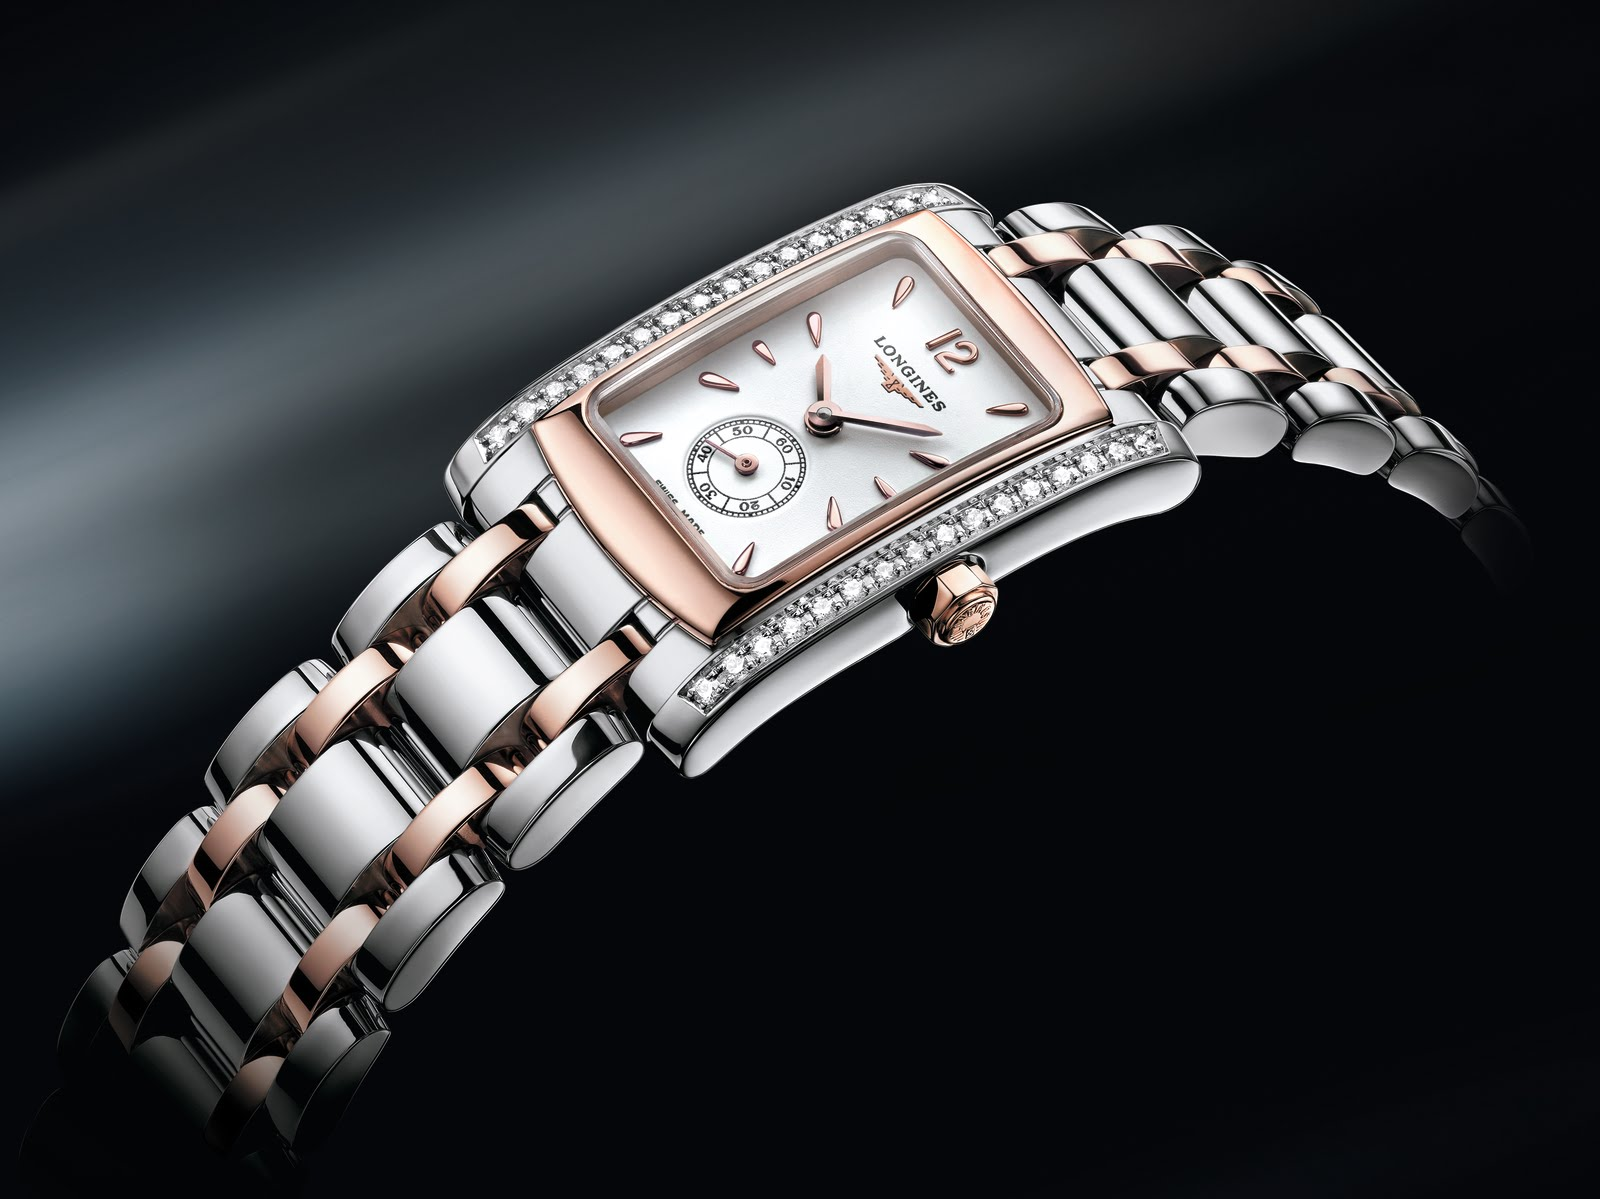 Gucci: nuova campagna pubblicitaria di orologi, testimonial Tippi Hedren